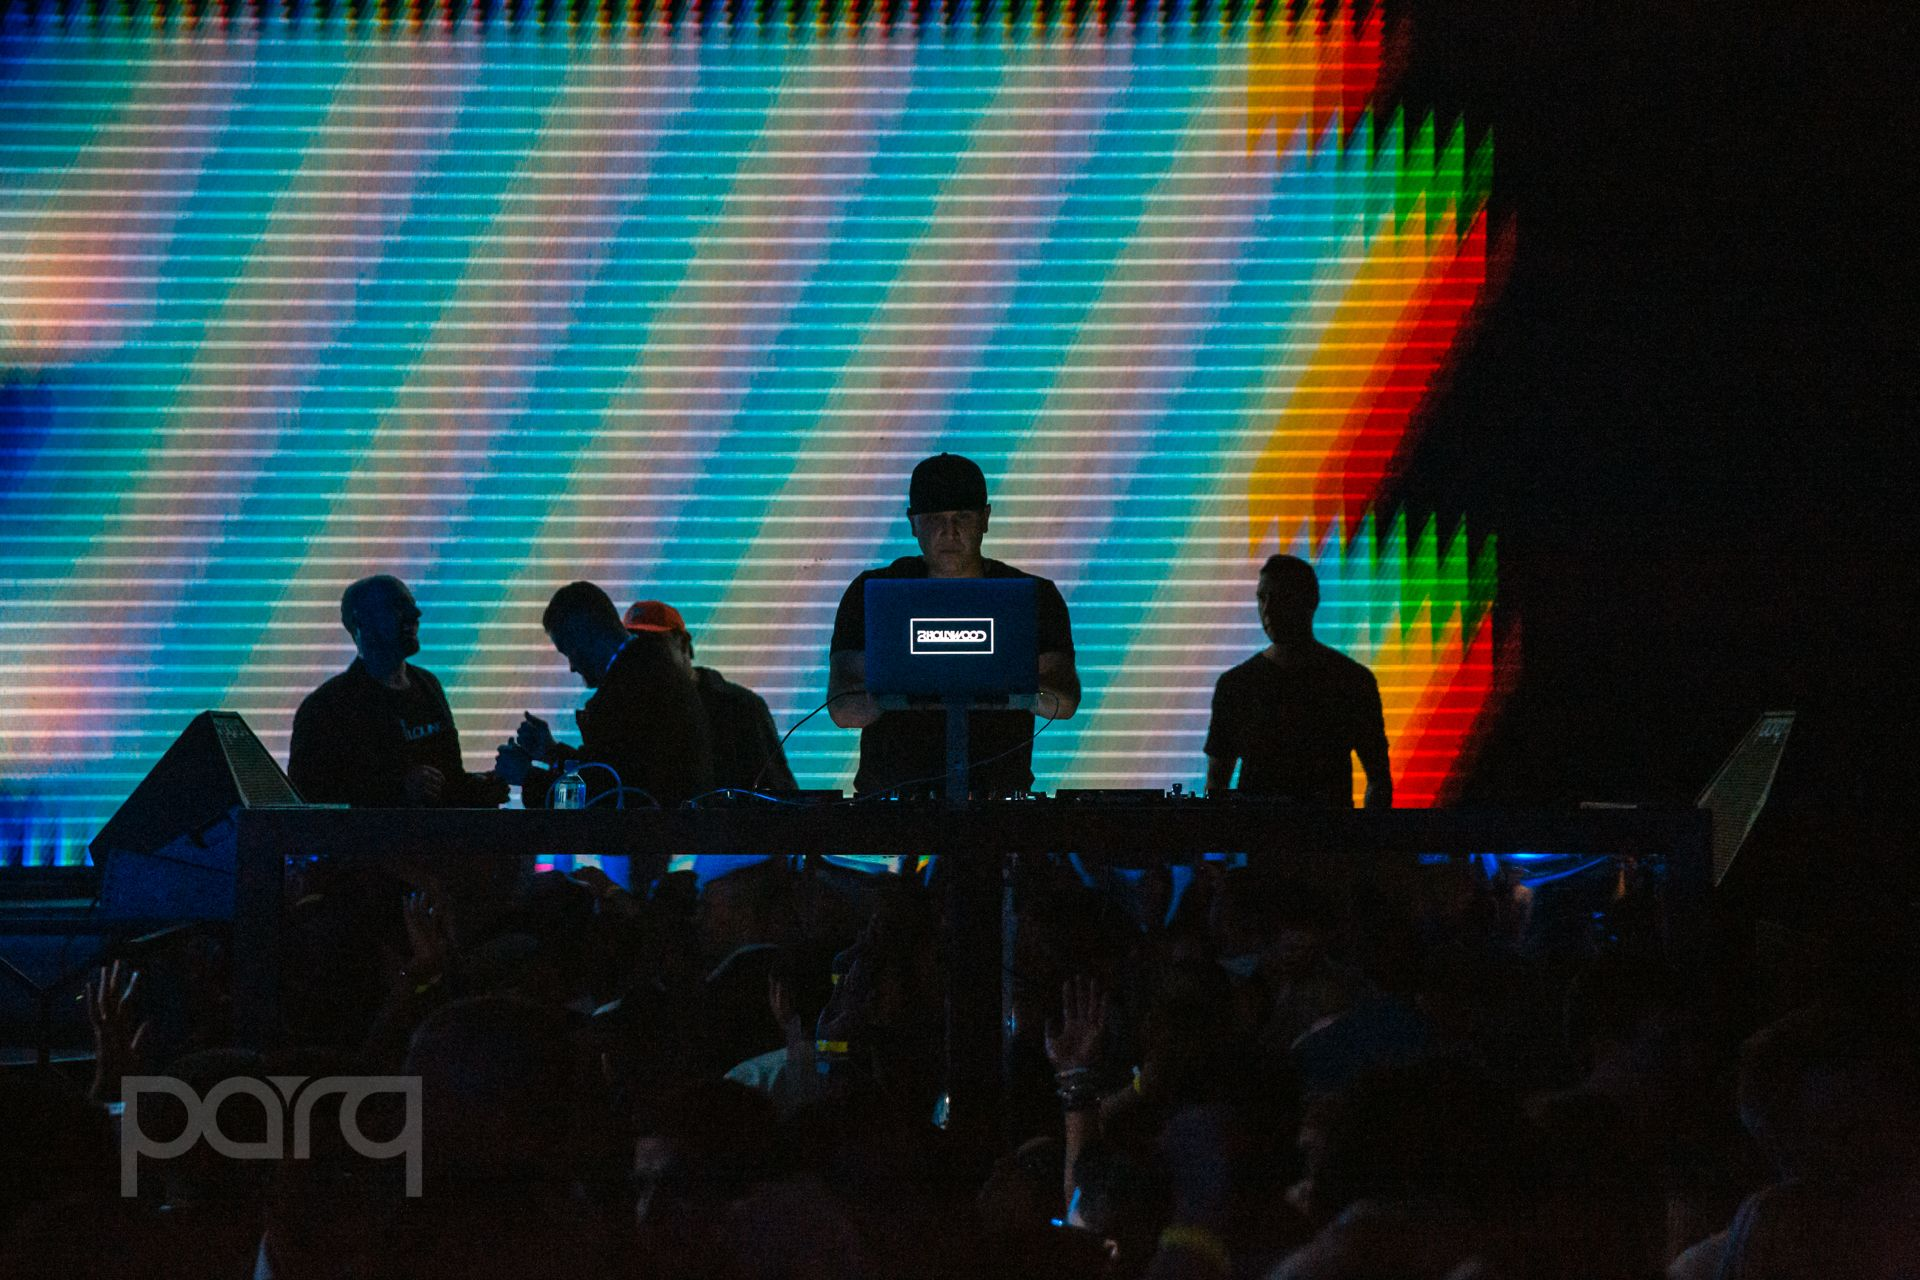 01.19.18 Parq - DJ Hollywood-19.jpg